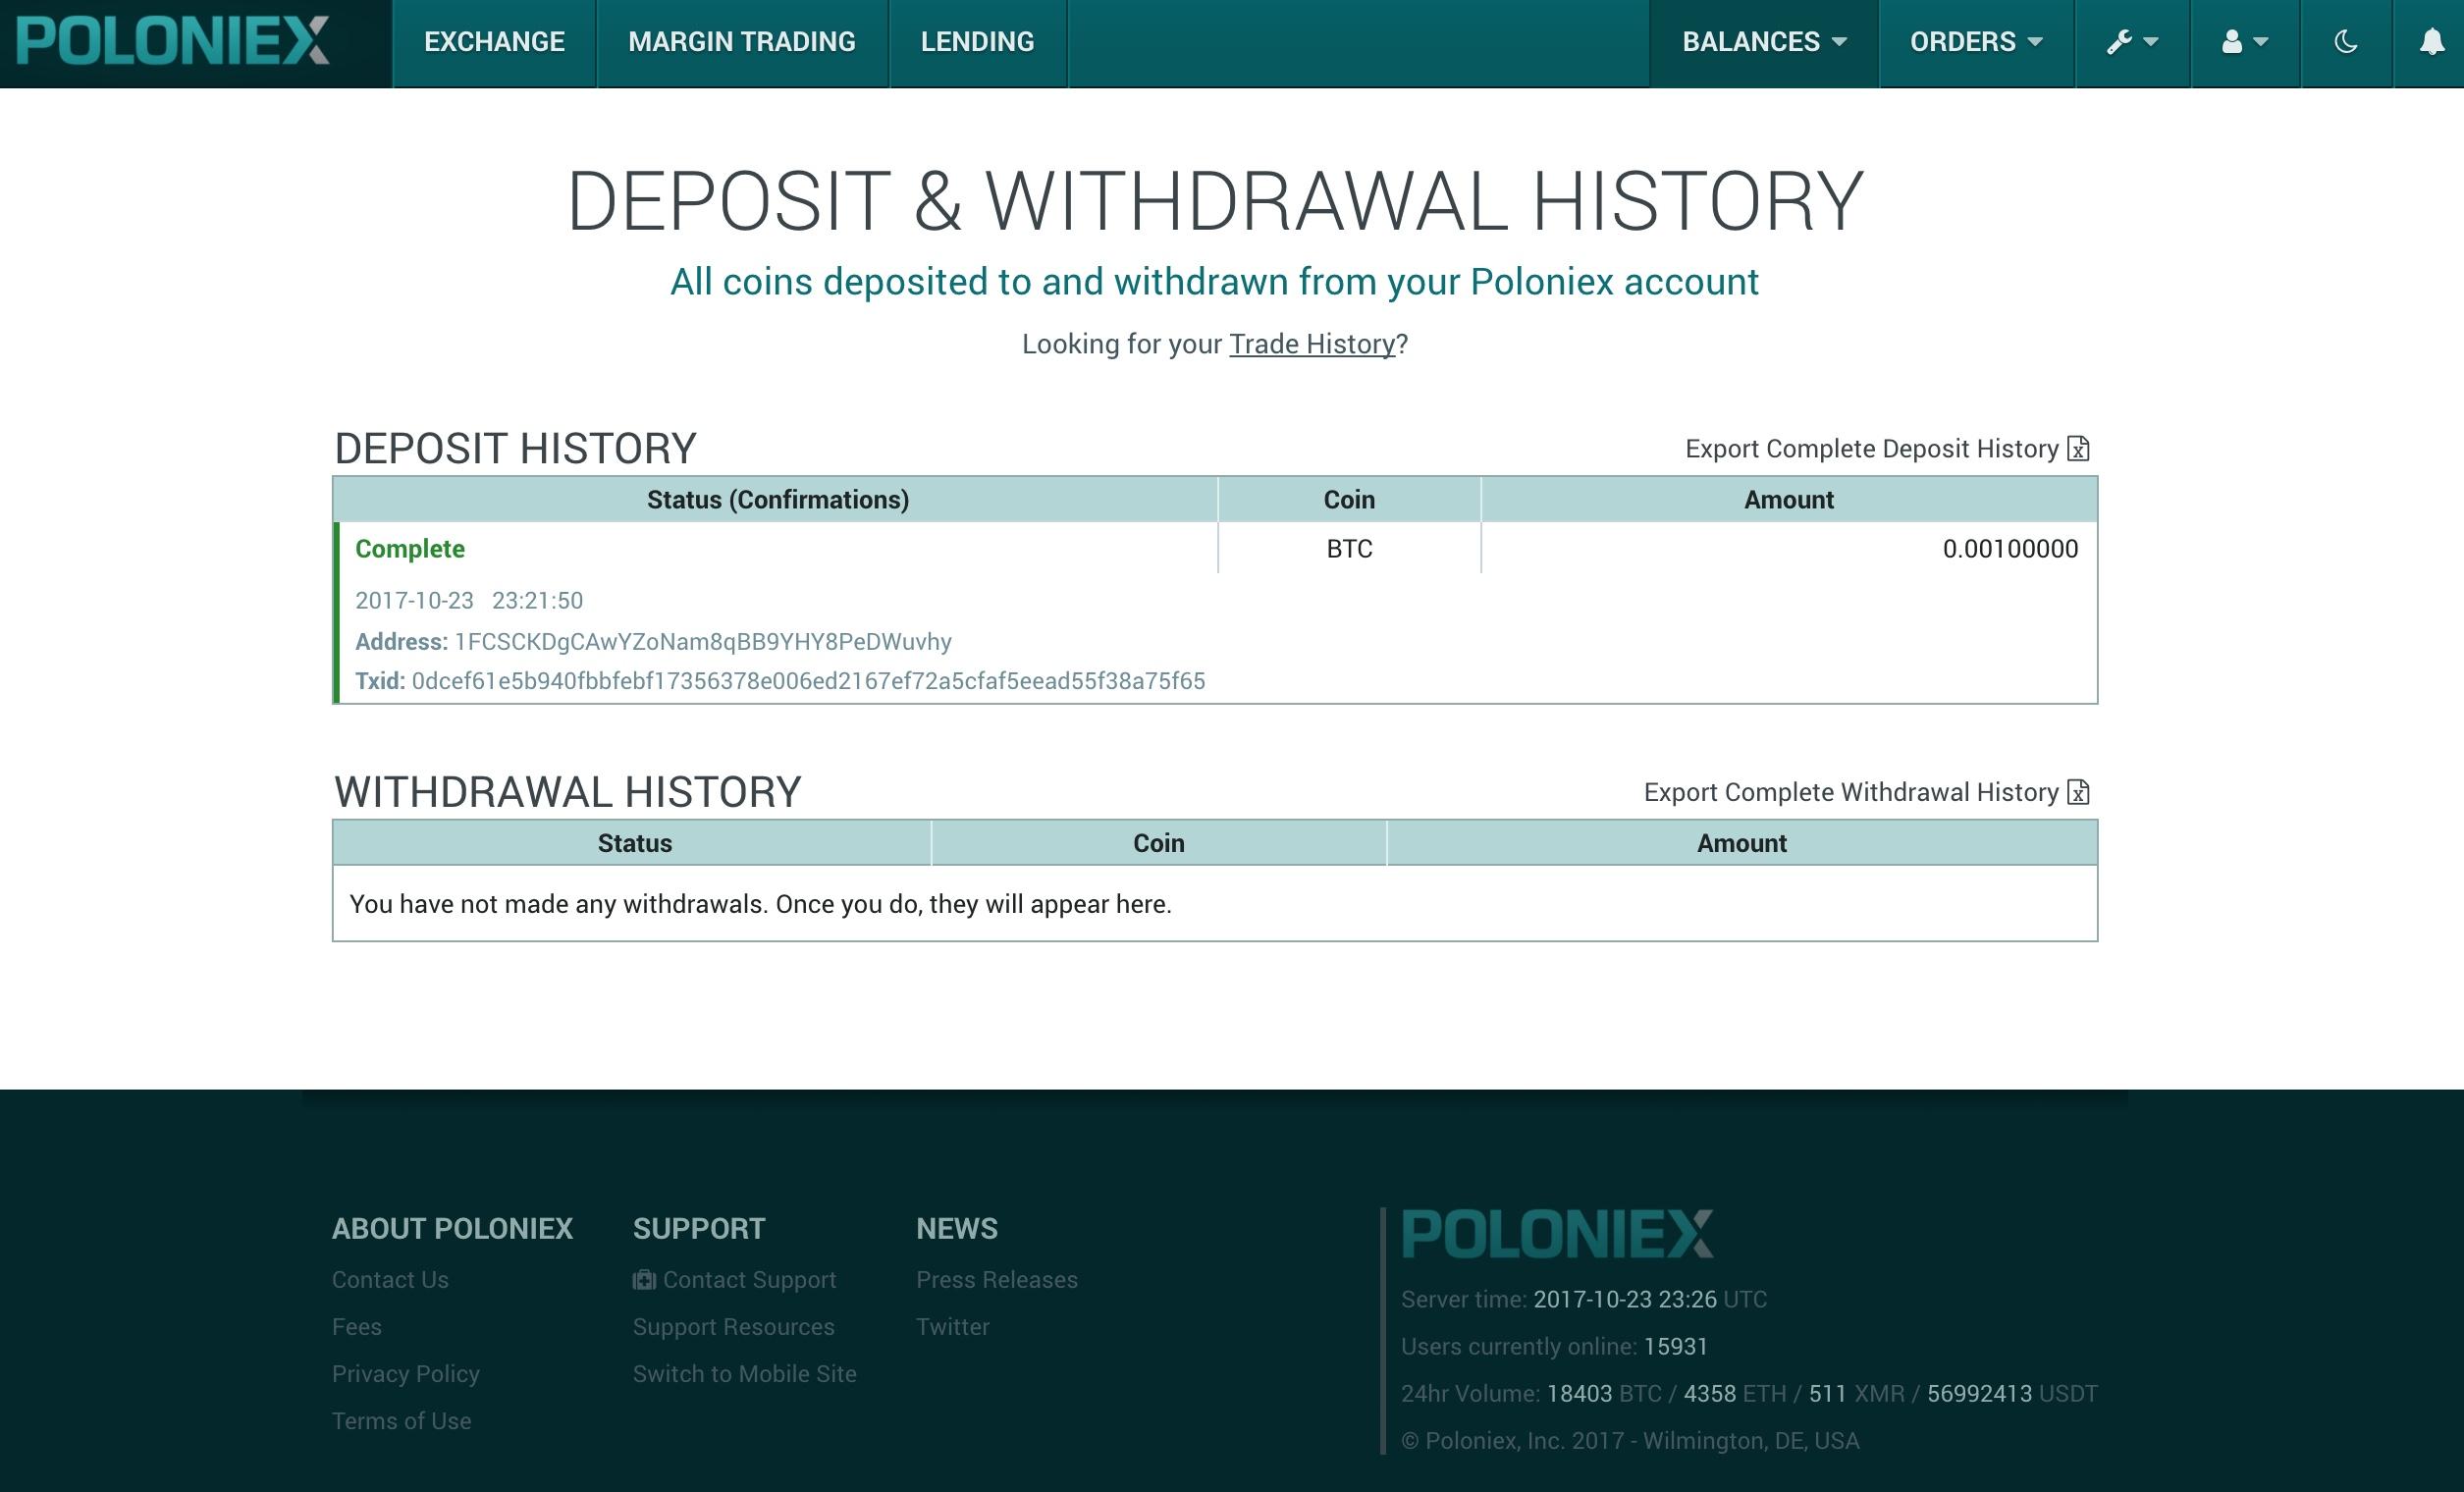 wann kommt der robinhood crypto trading? investiert in kryptowährung legal in florida